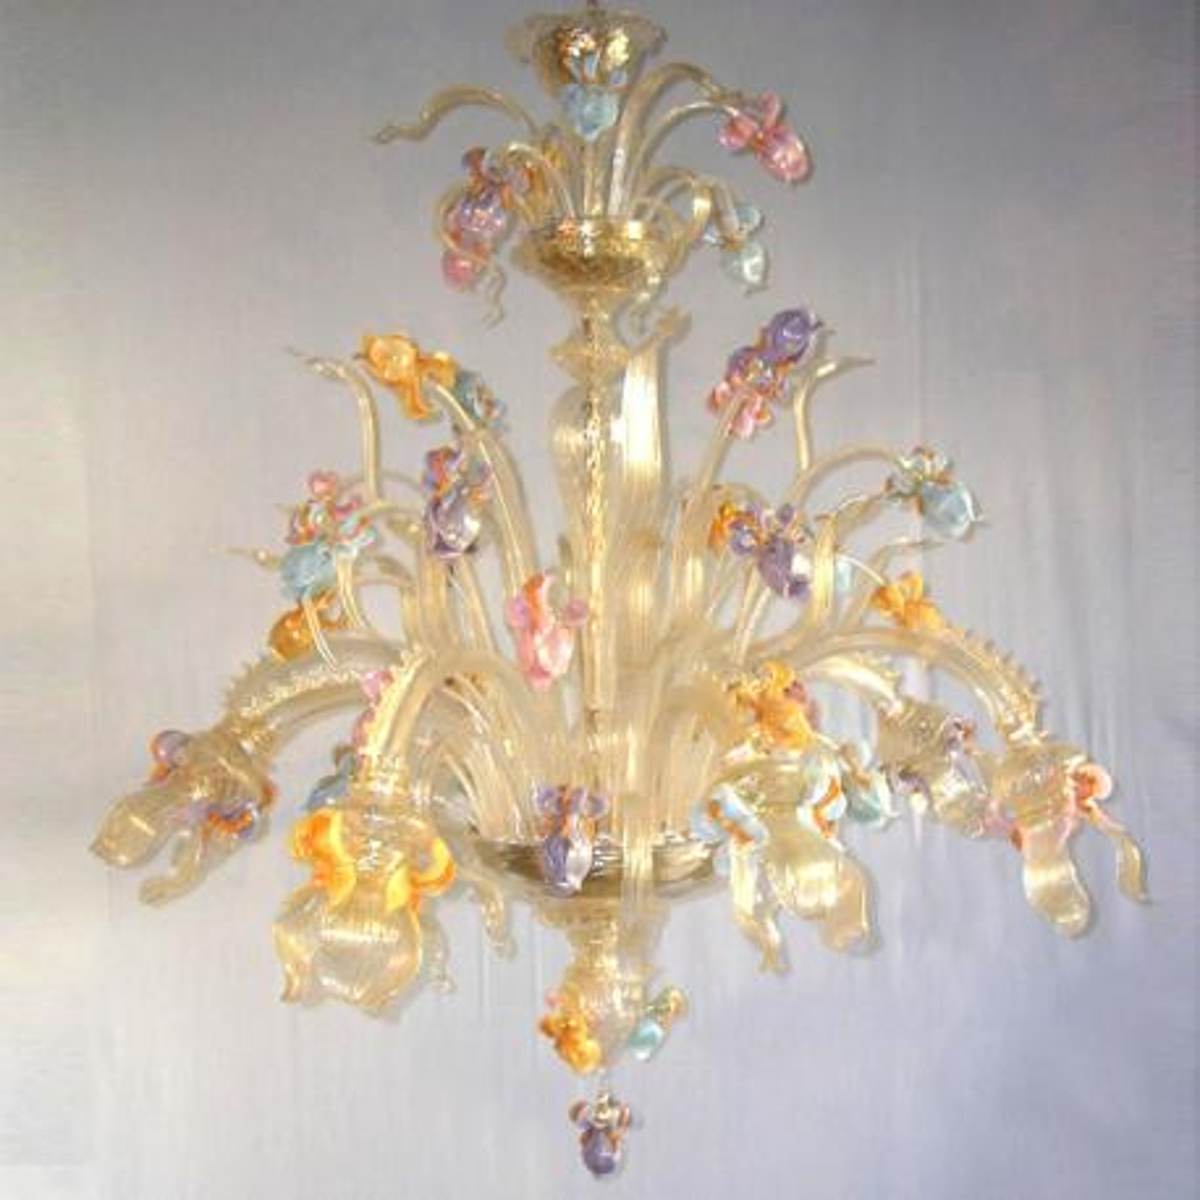 """Iris Dorato"" lustre en cristal de Murano - 6 lumières - or"